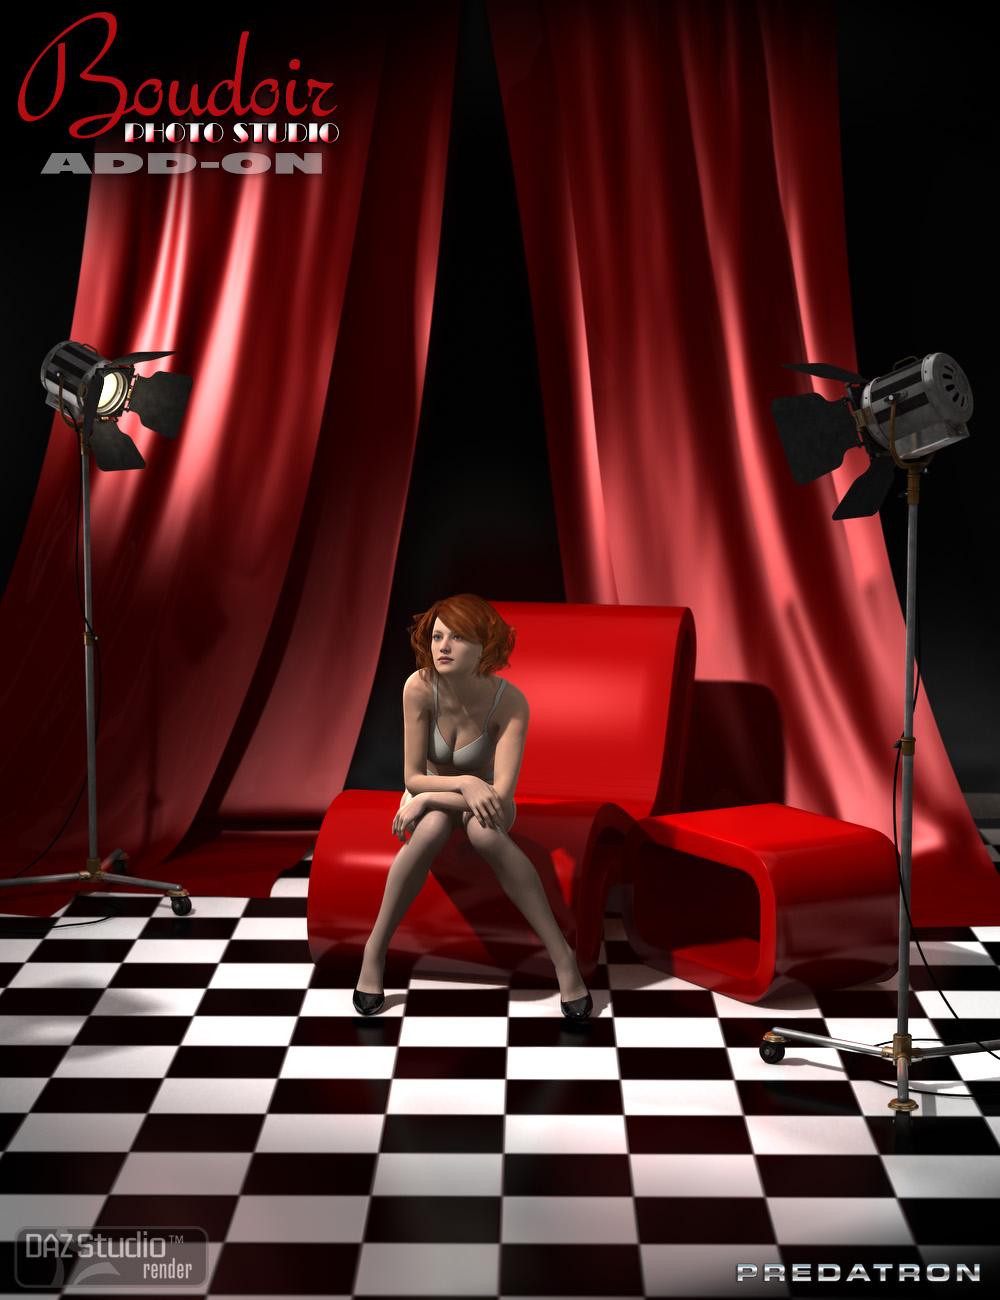 Boudoir Photo Studio Add-On by: DianePredatron, 3D Models by Daz 3D